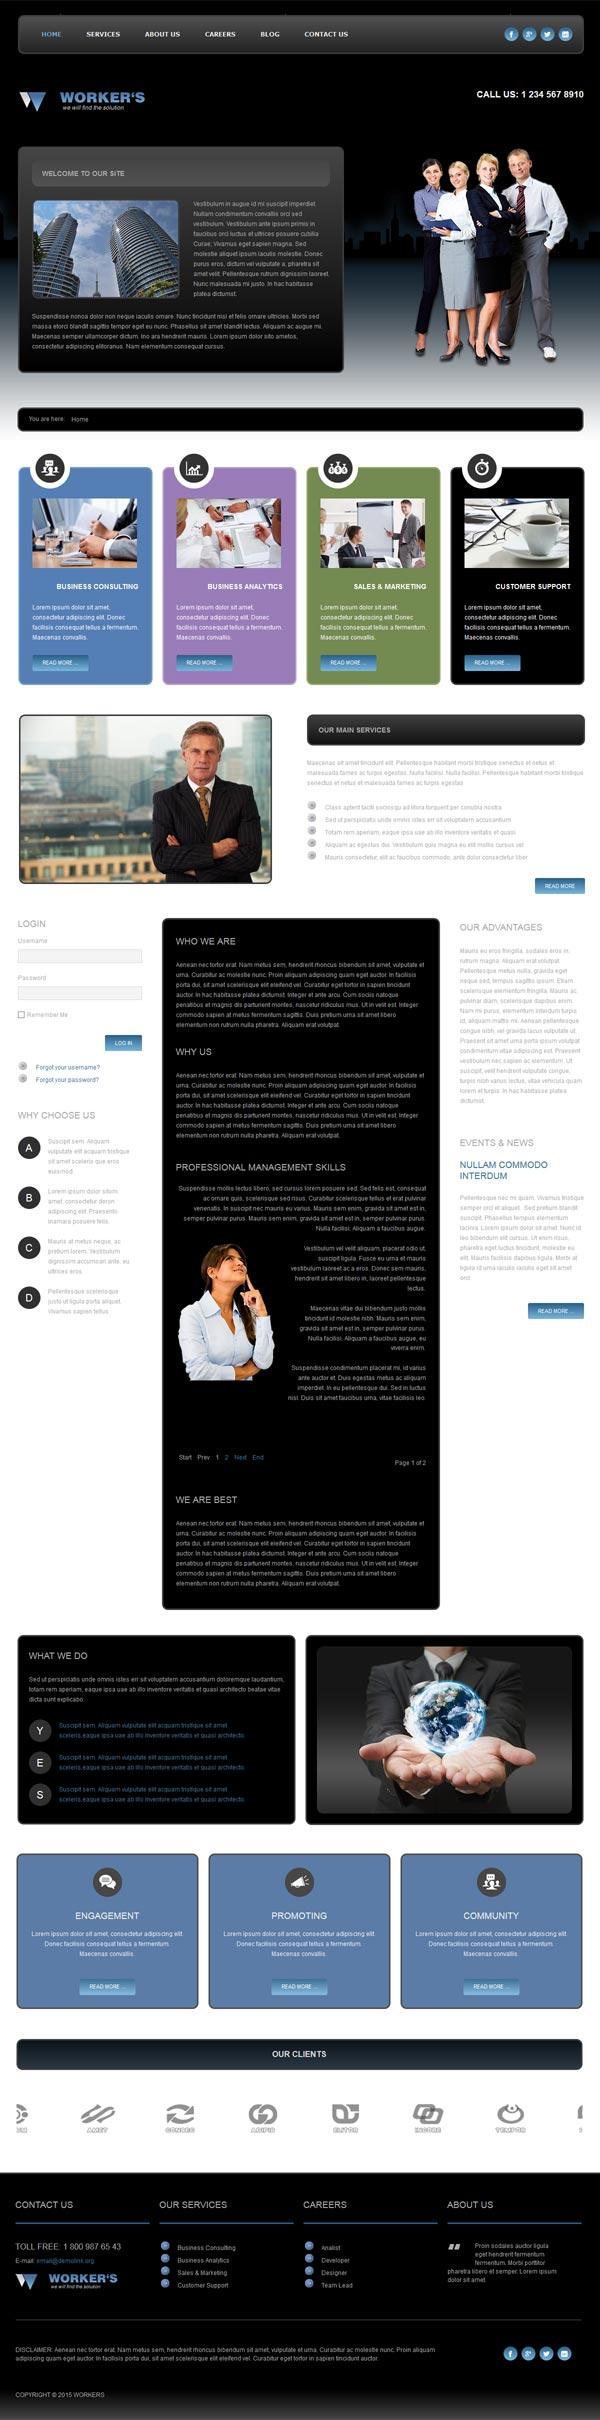 Business Joomla! template